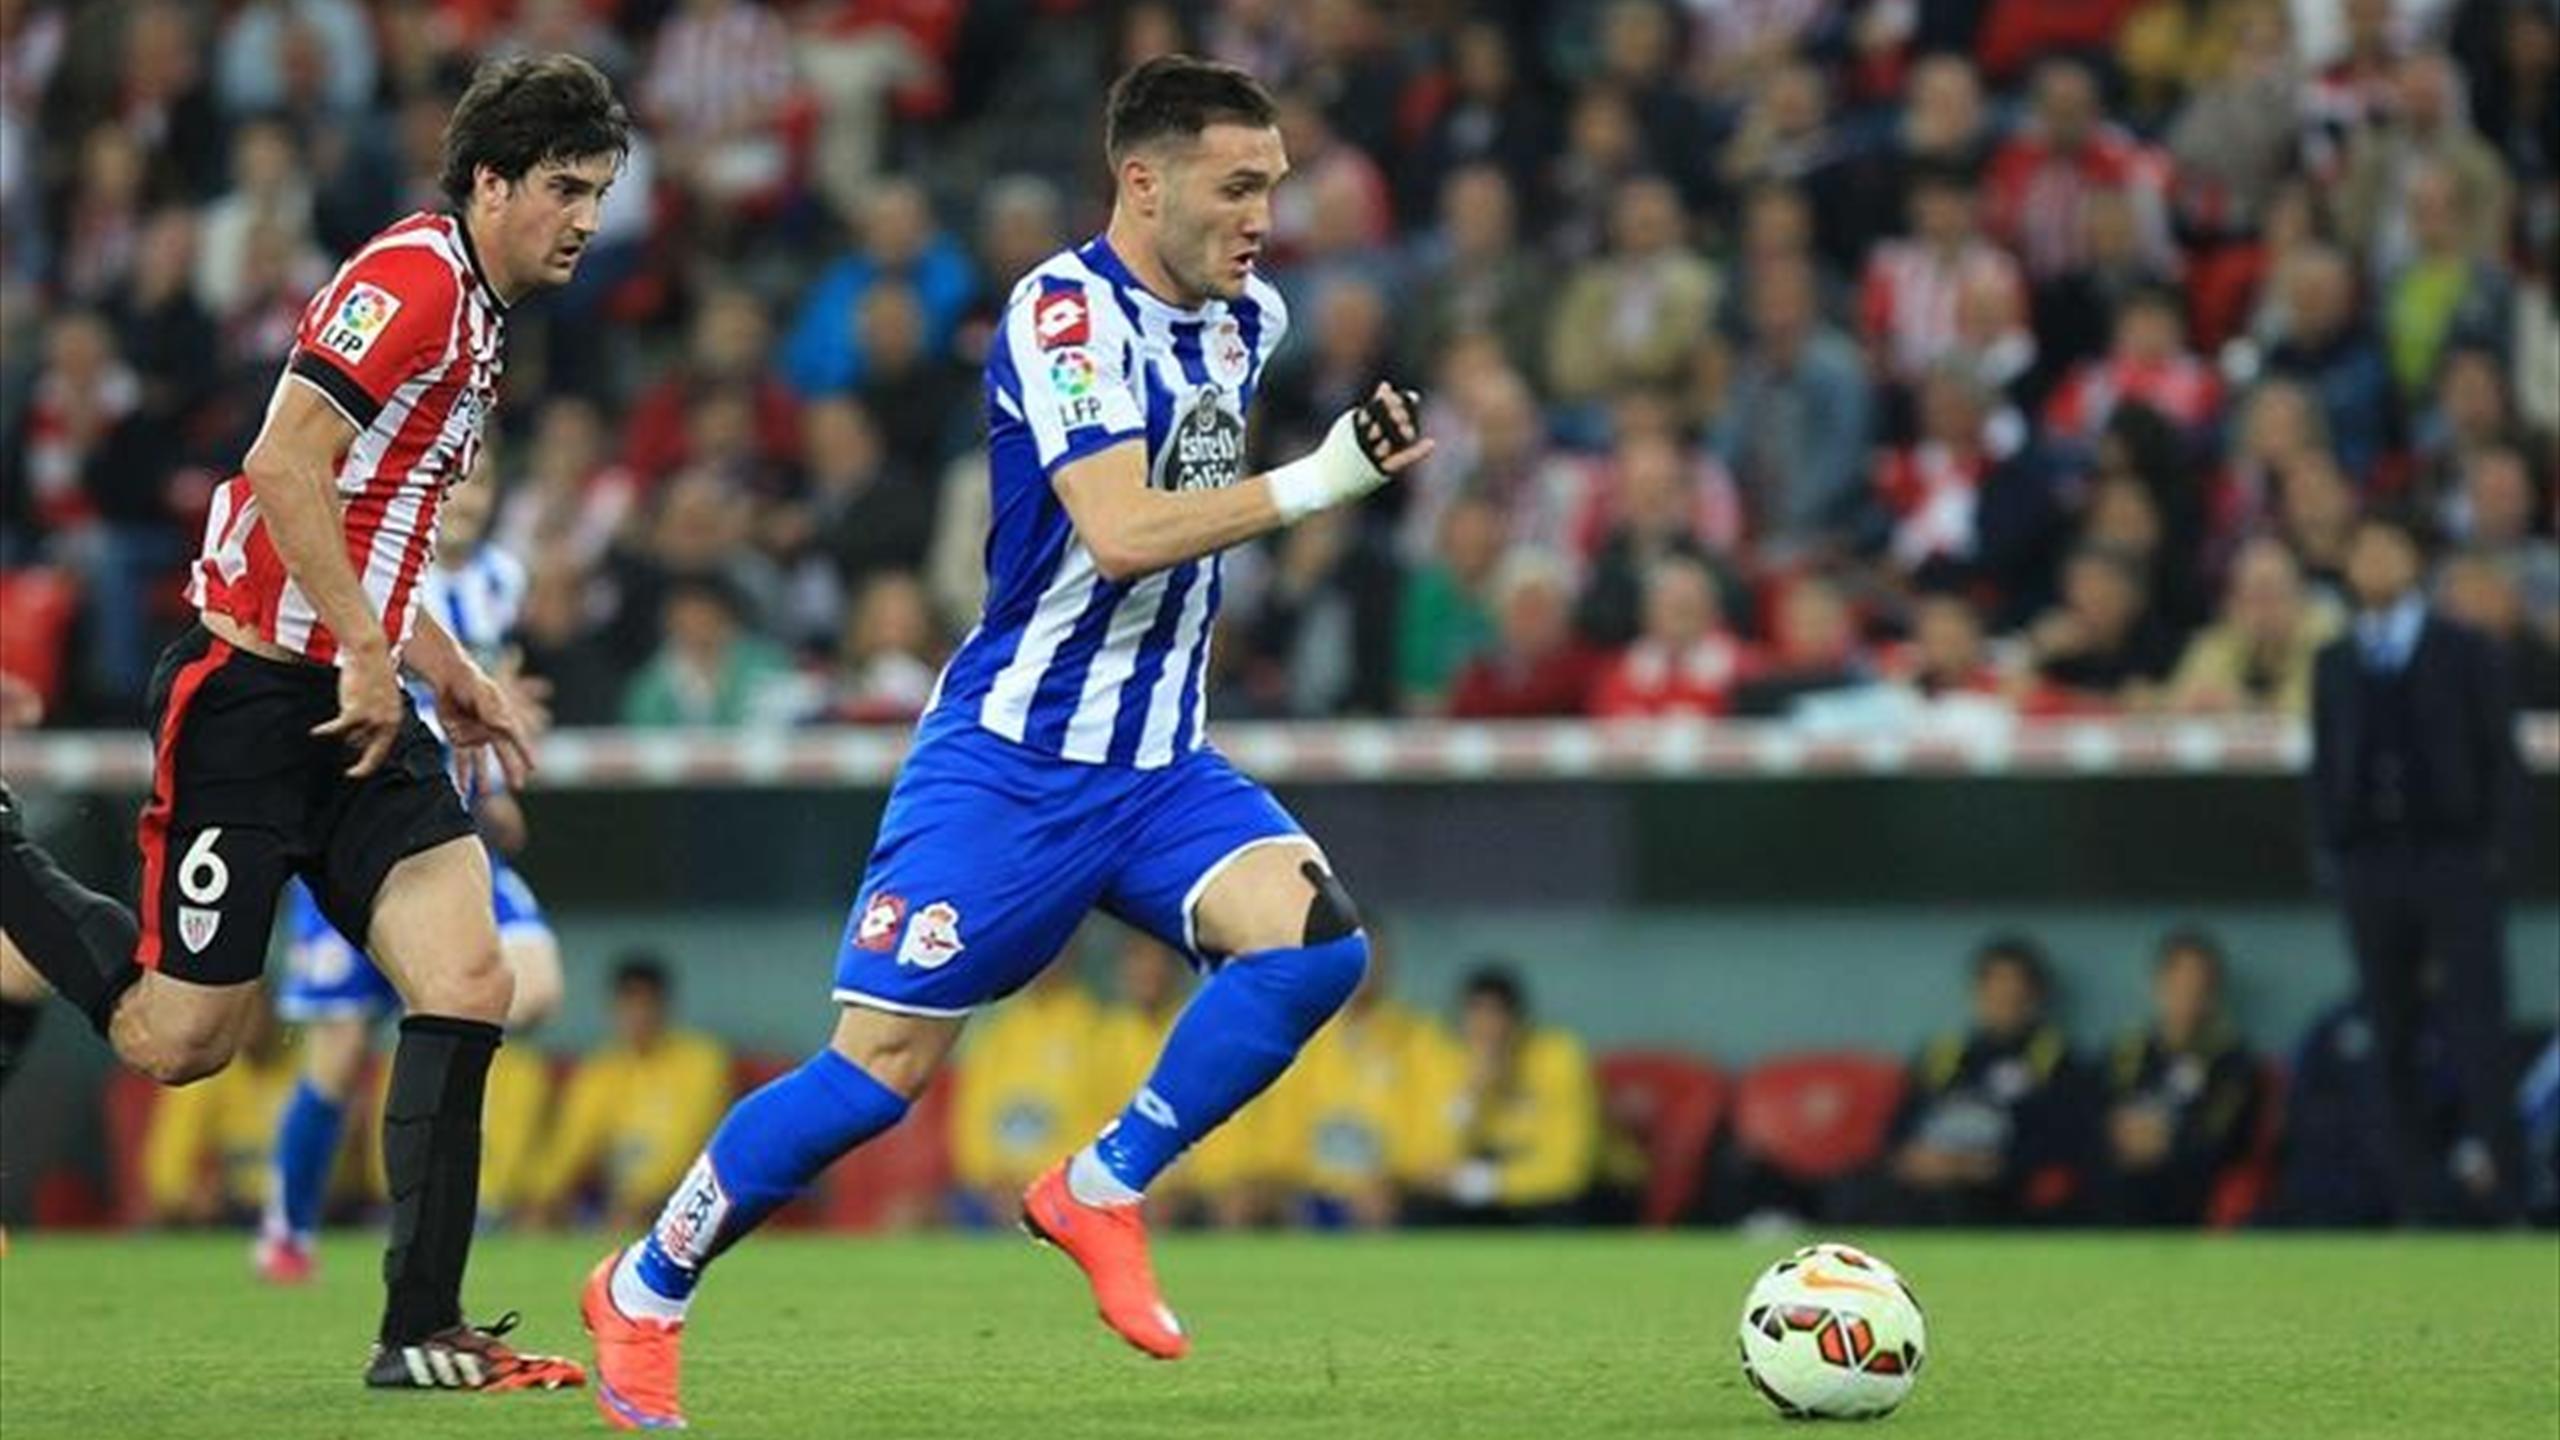 Video: Athletic Bilbao vs Deportivo La Coruna